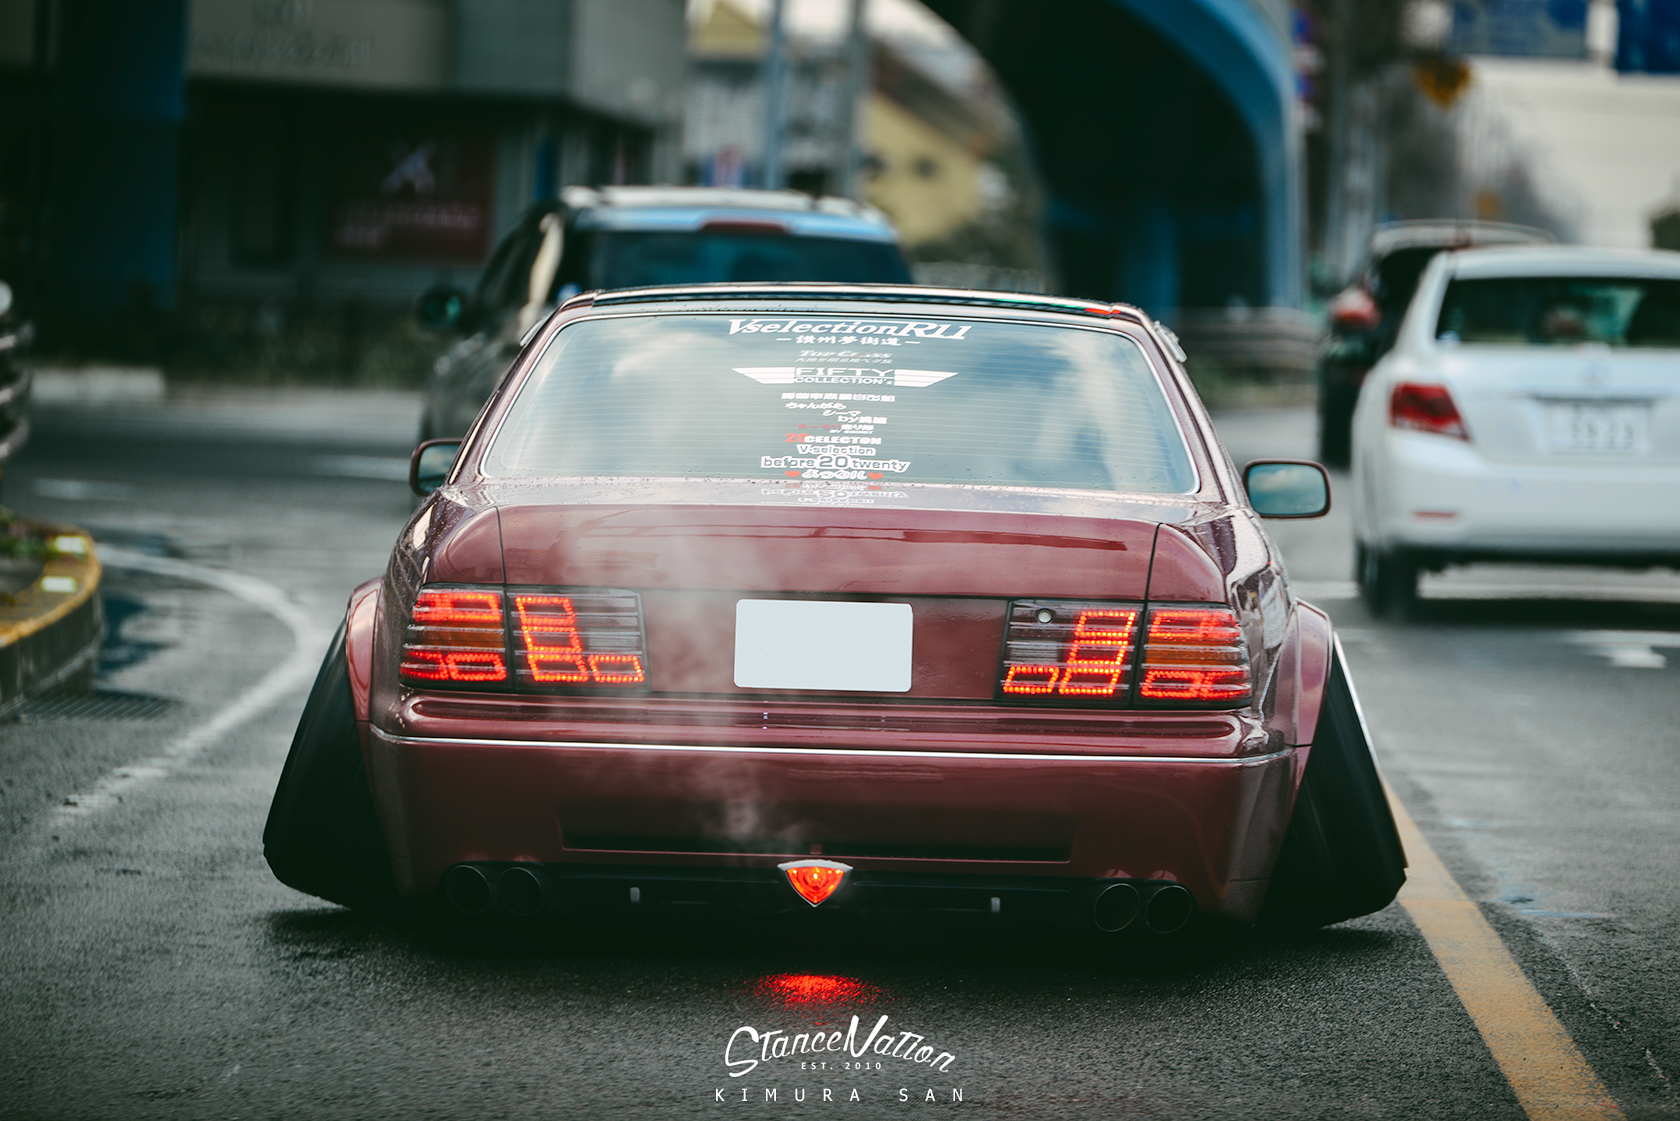 oni-camber-lexus-ls400-japan-vip-12